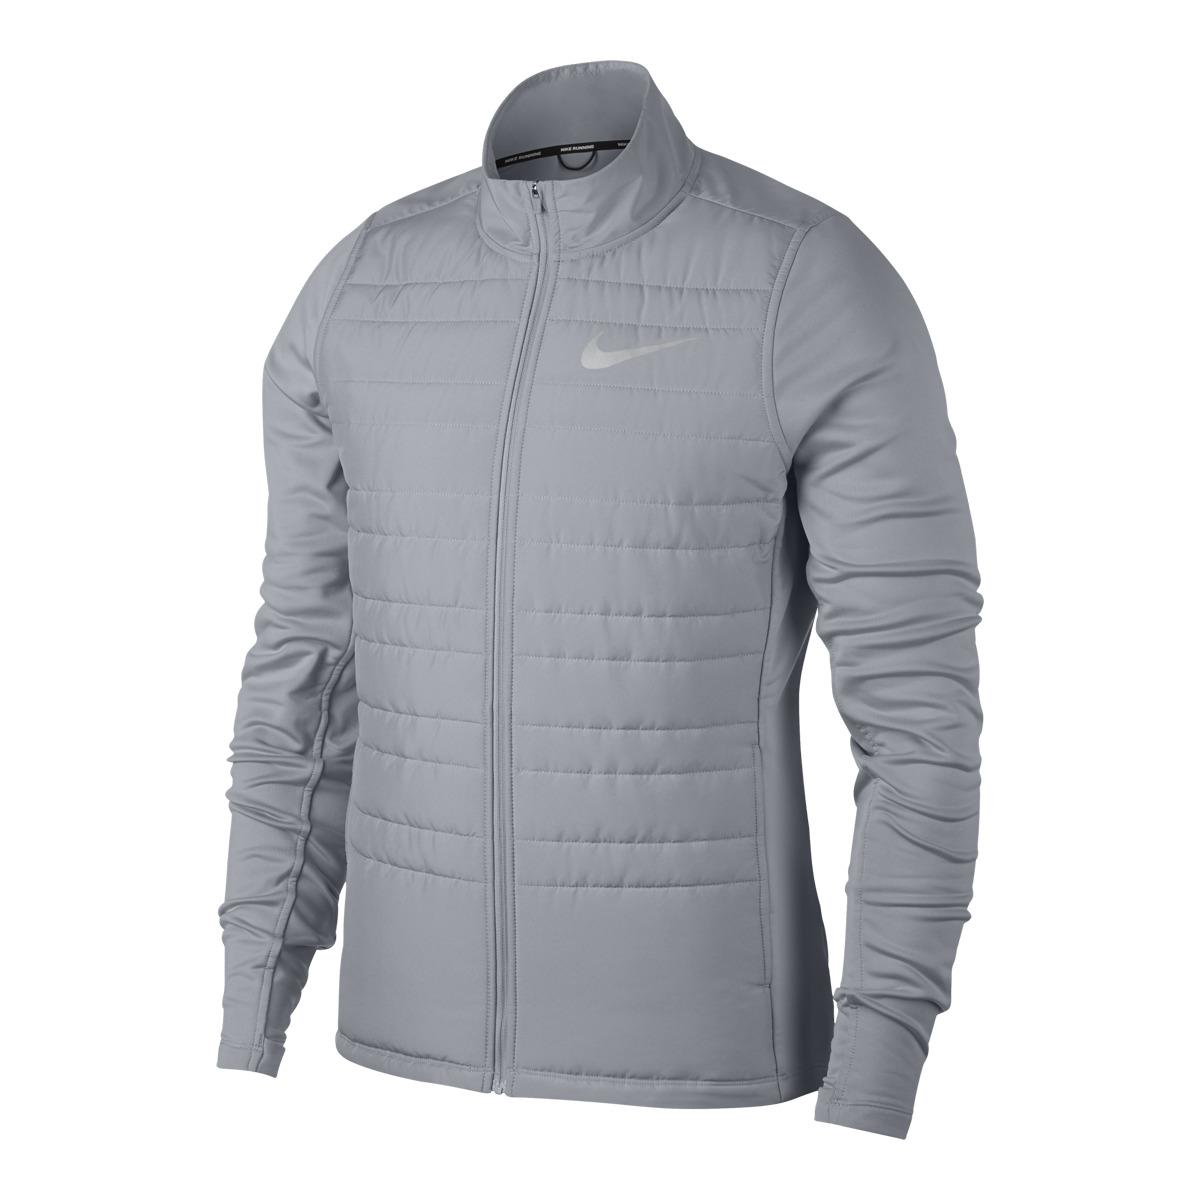 03830759b7ff Lyst - Nike Essential Windcheater Jacket in Gray for Men